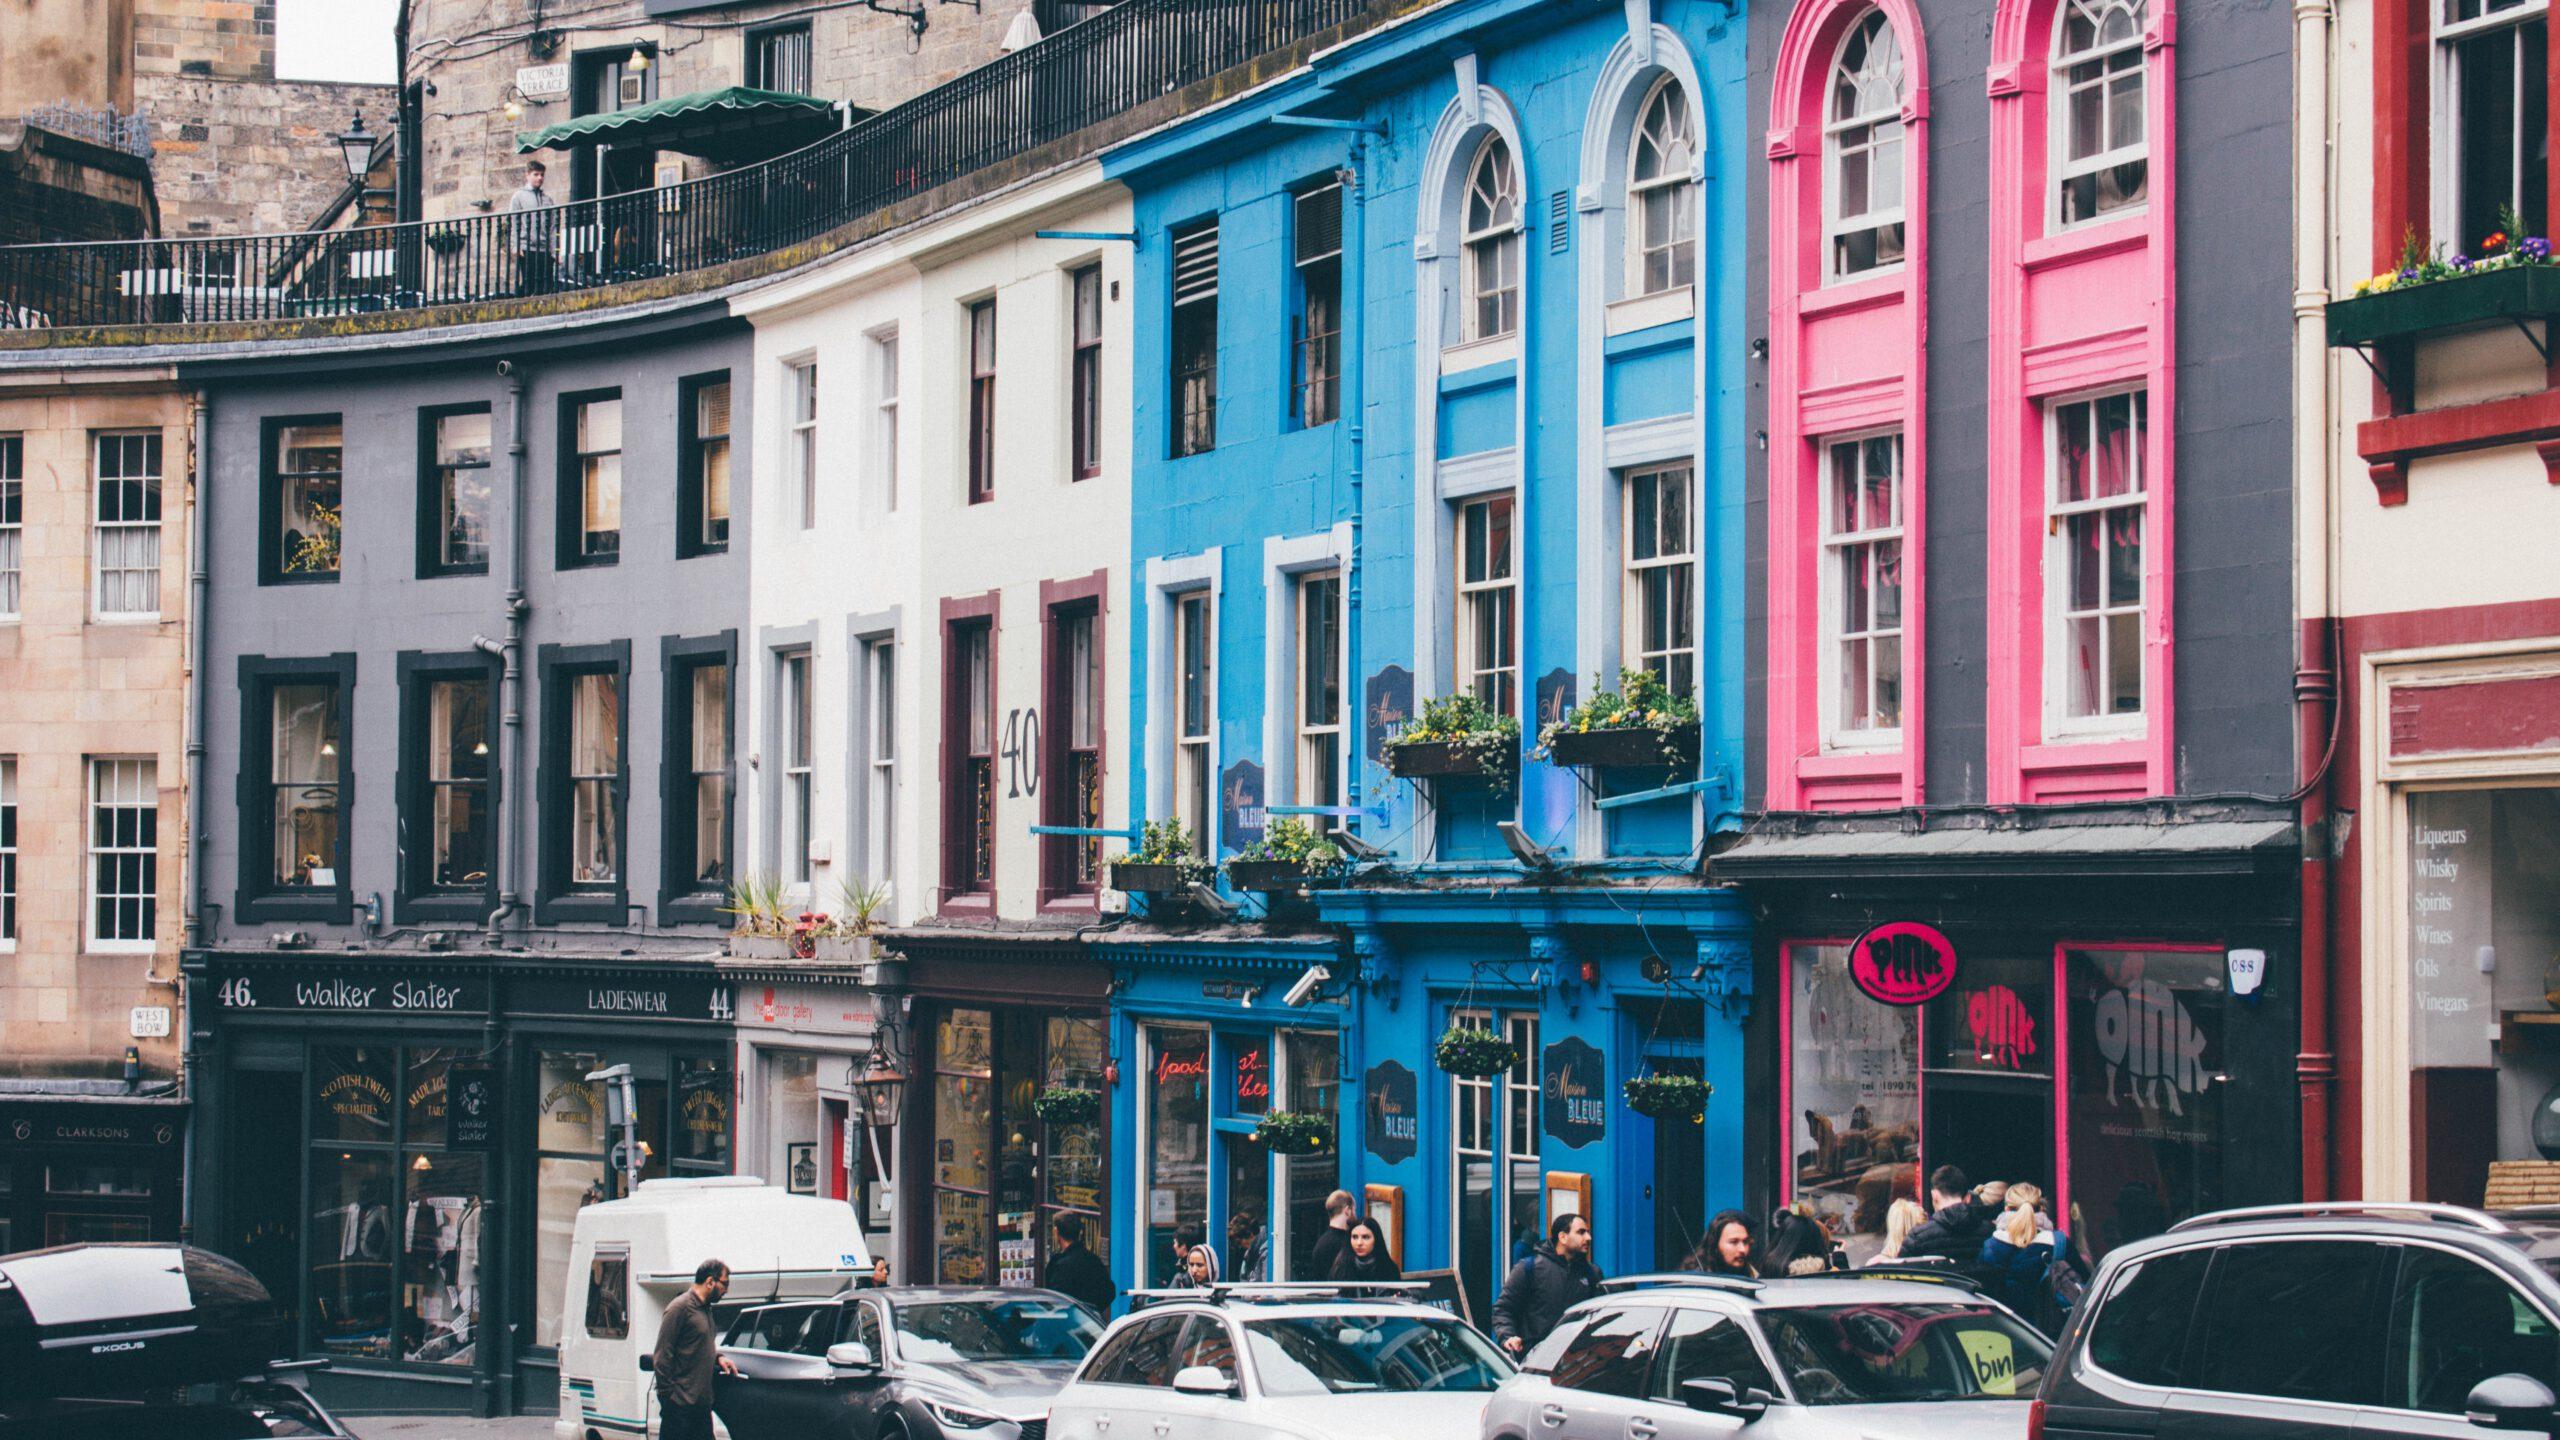 engeland-edinburgh-victoria street-winkelstraat